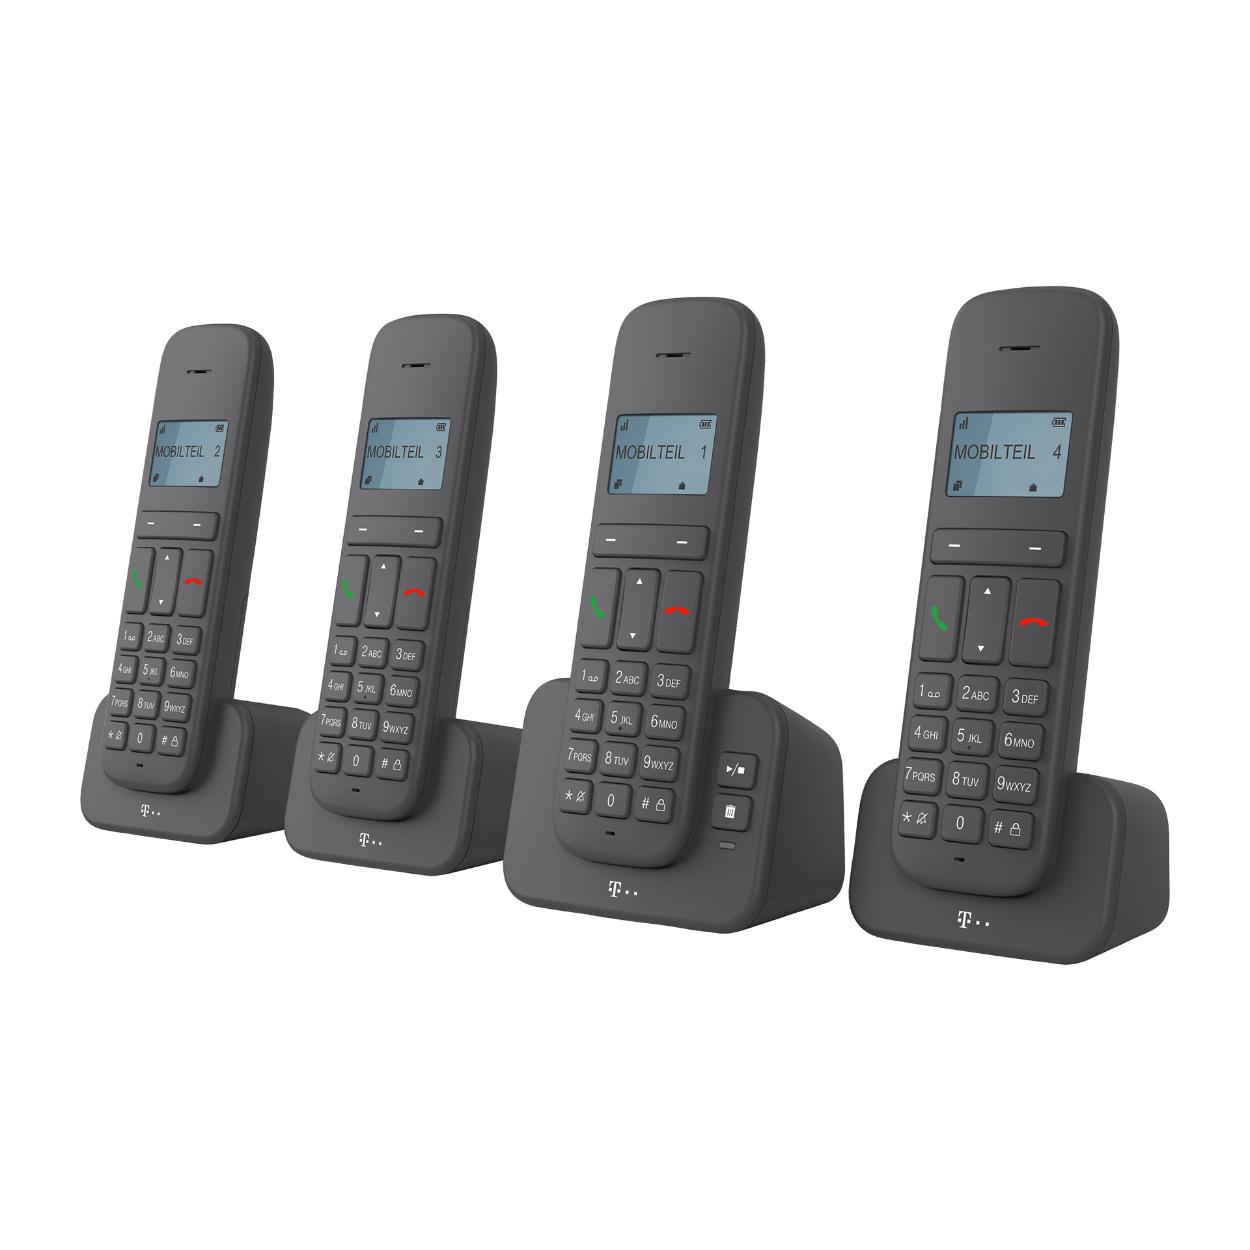 ALDI NORD - DECT Telekom Sinus Quattro Telefon mit AB - Ab 28.01.21 in der Filiale